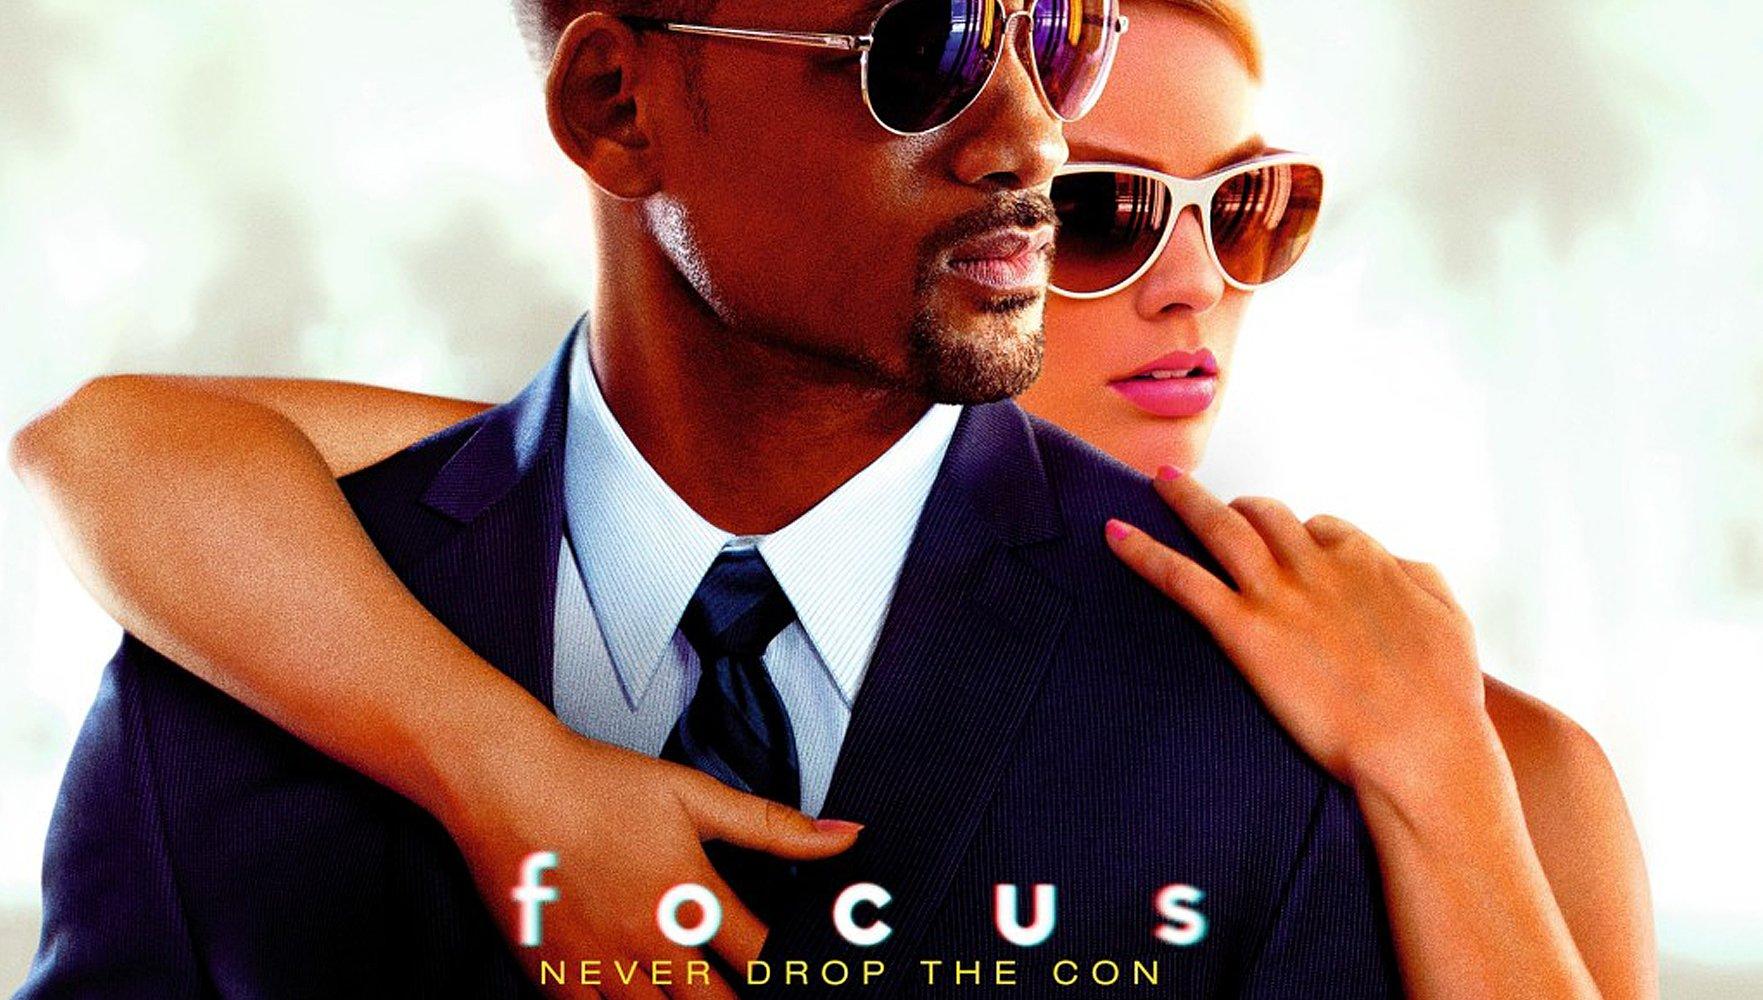 Focus - Critique du film de Glenn Ficarra et John Requa